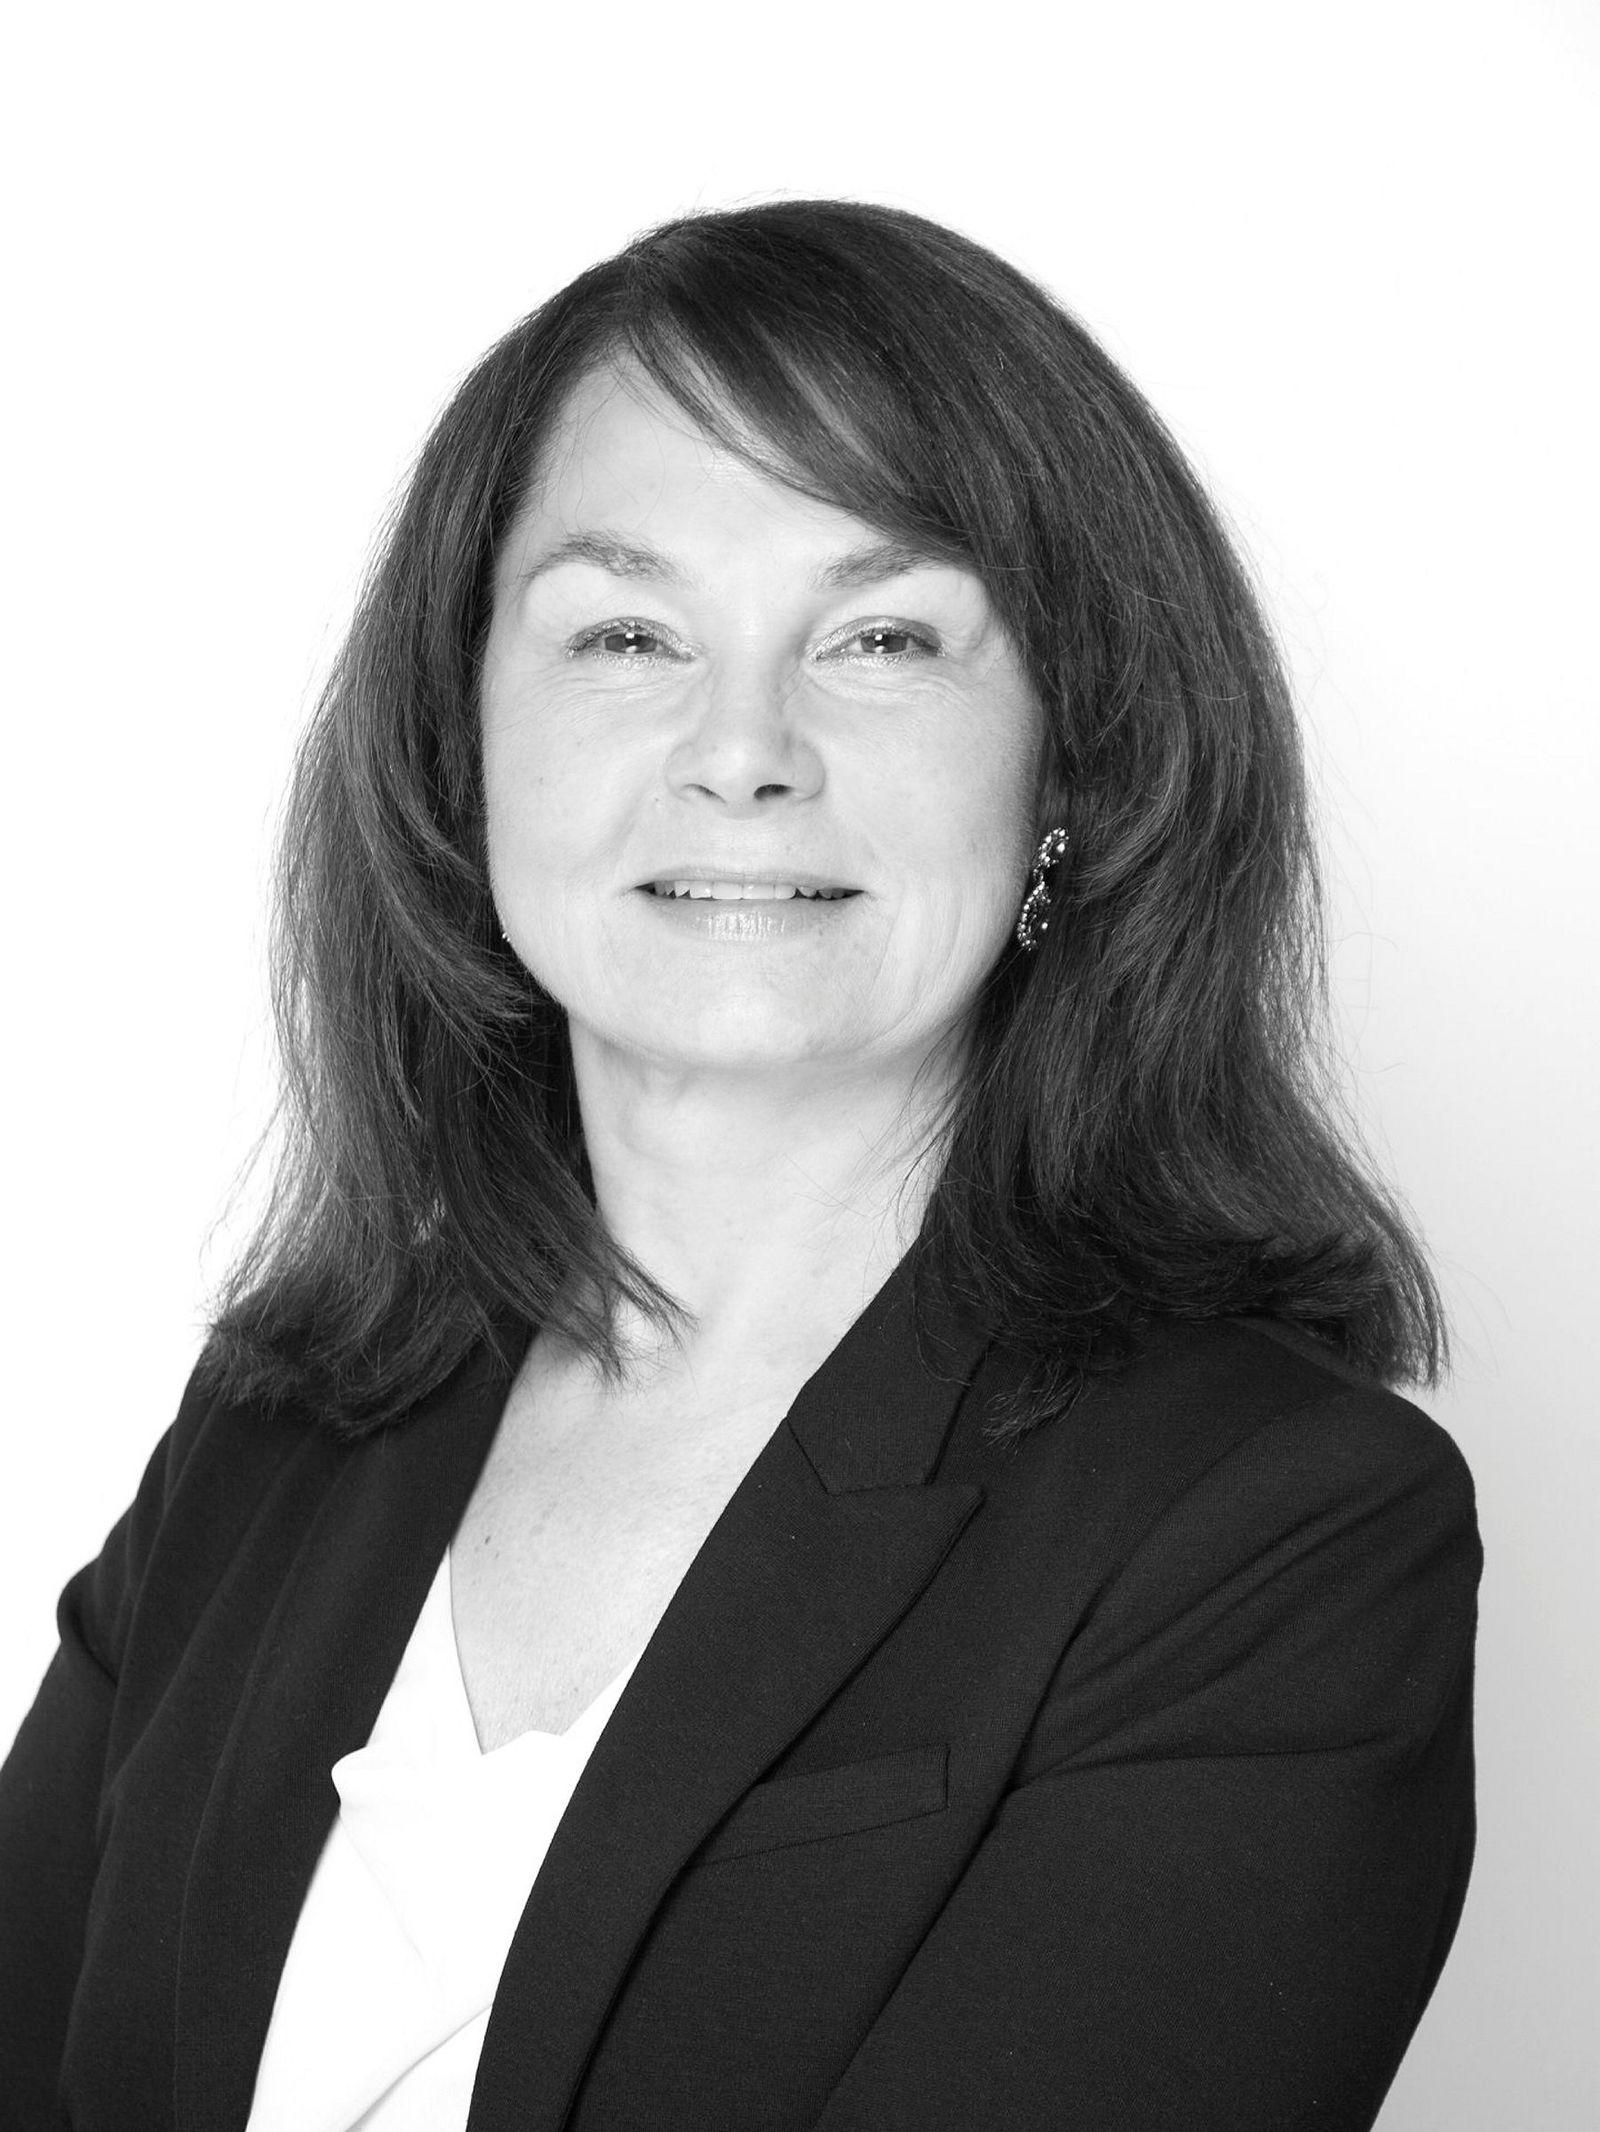 Karin Løkke